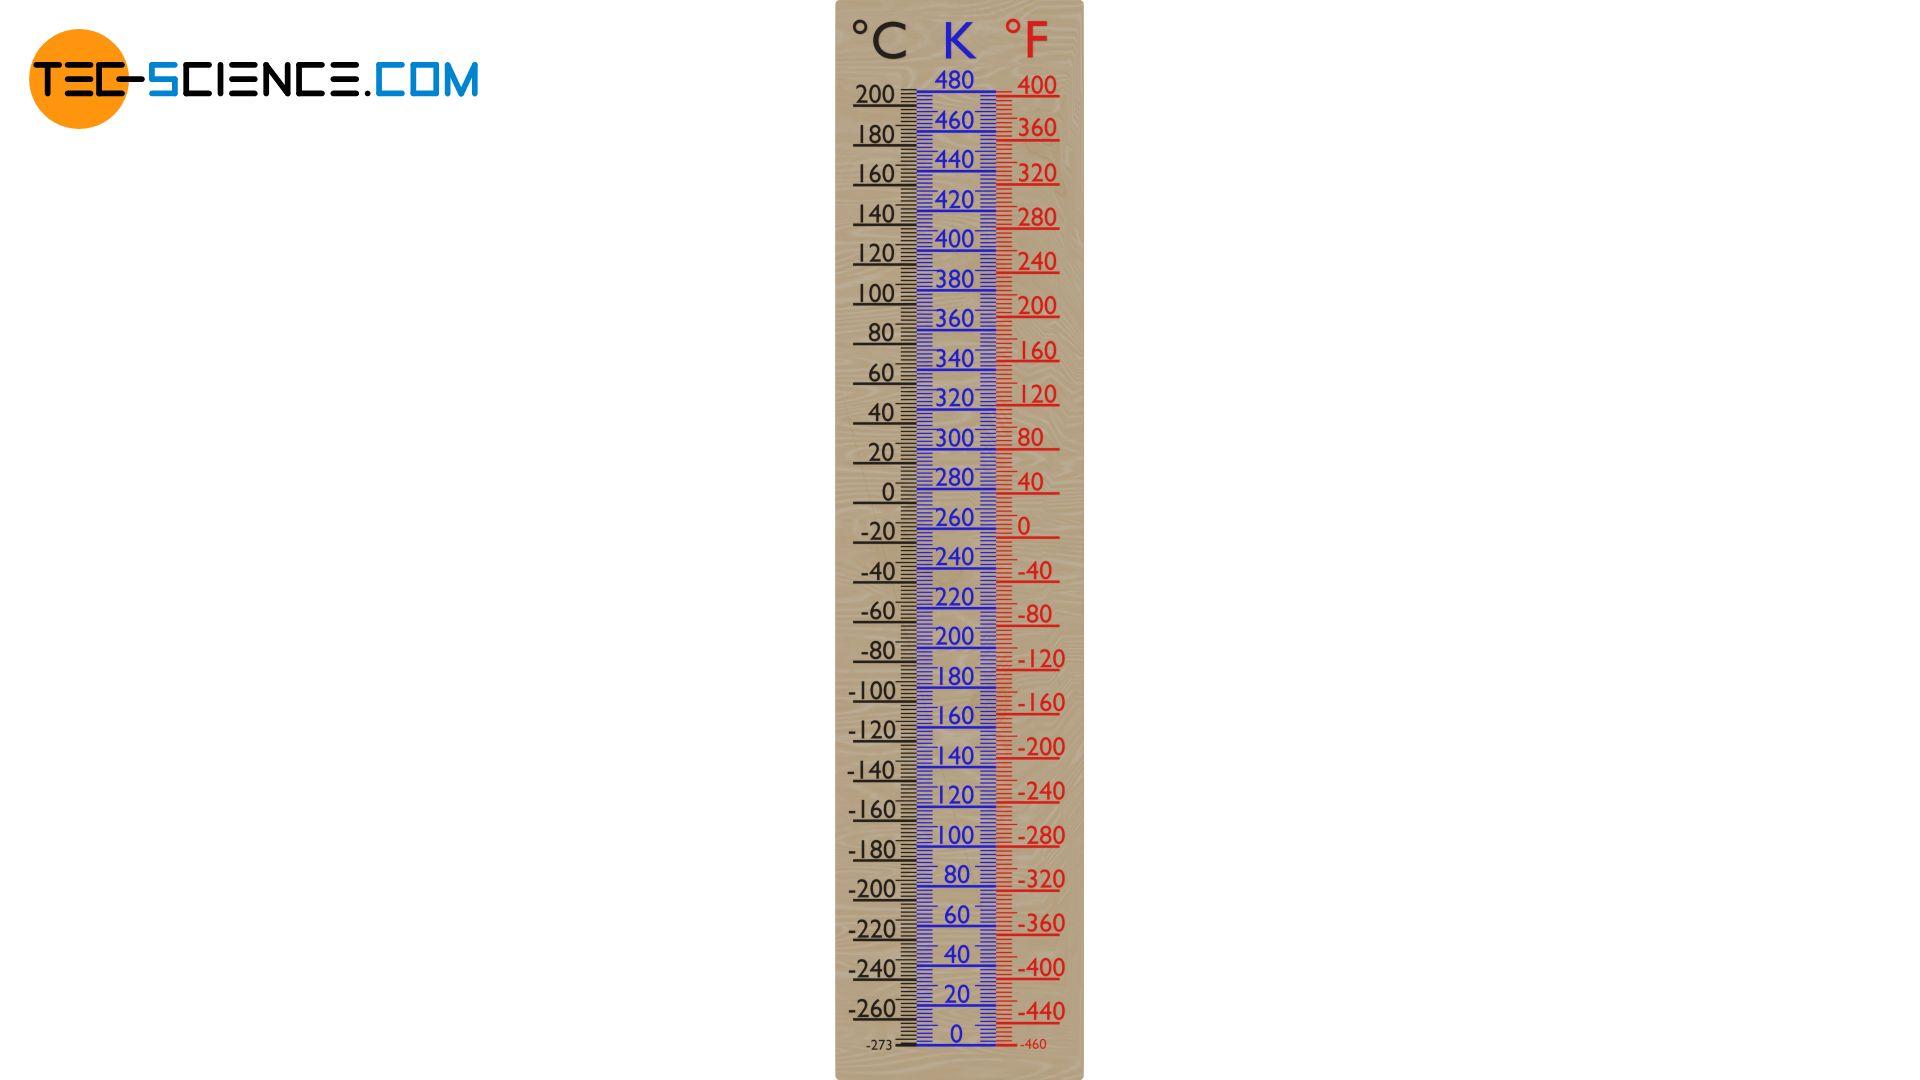 Celsius, Kelvin and Fahrenheit scale in comparison